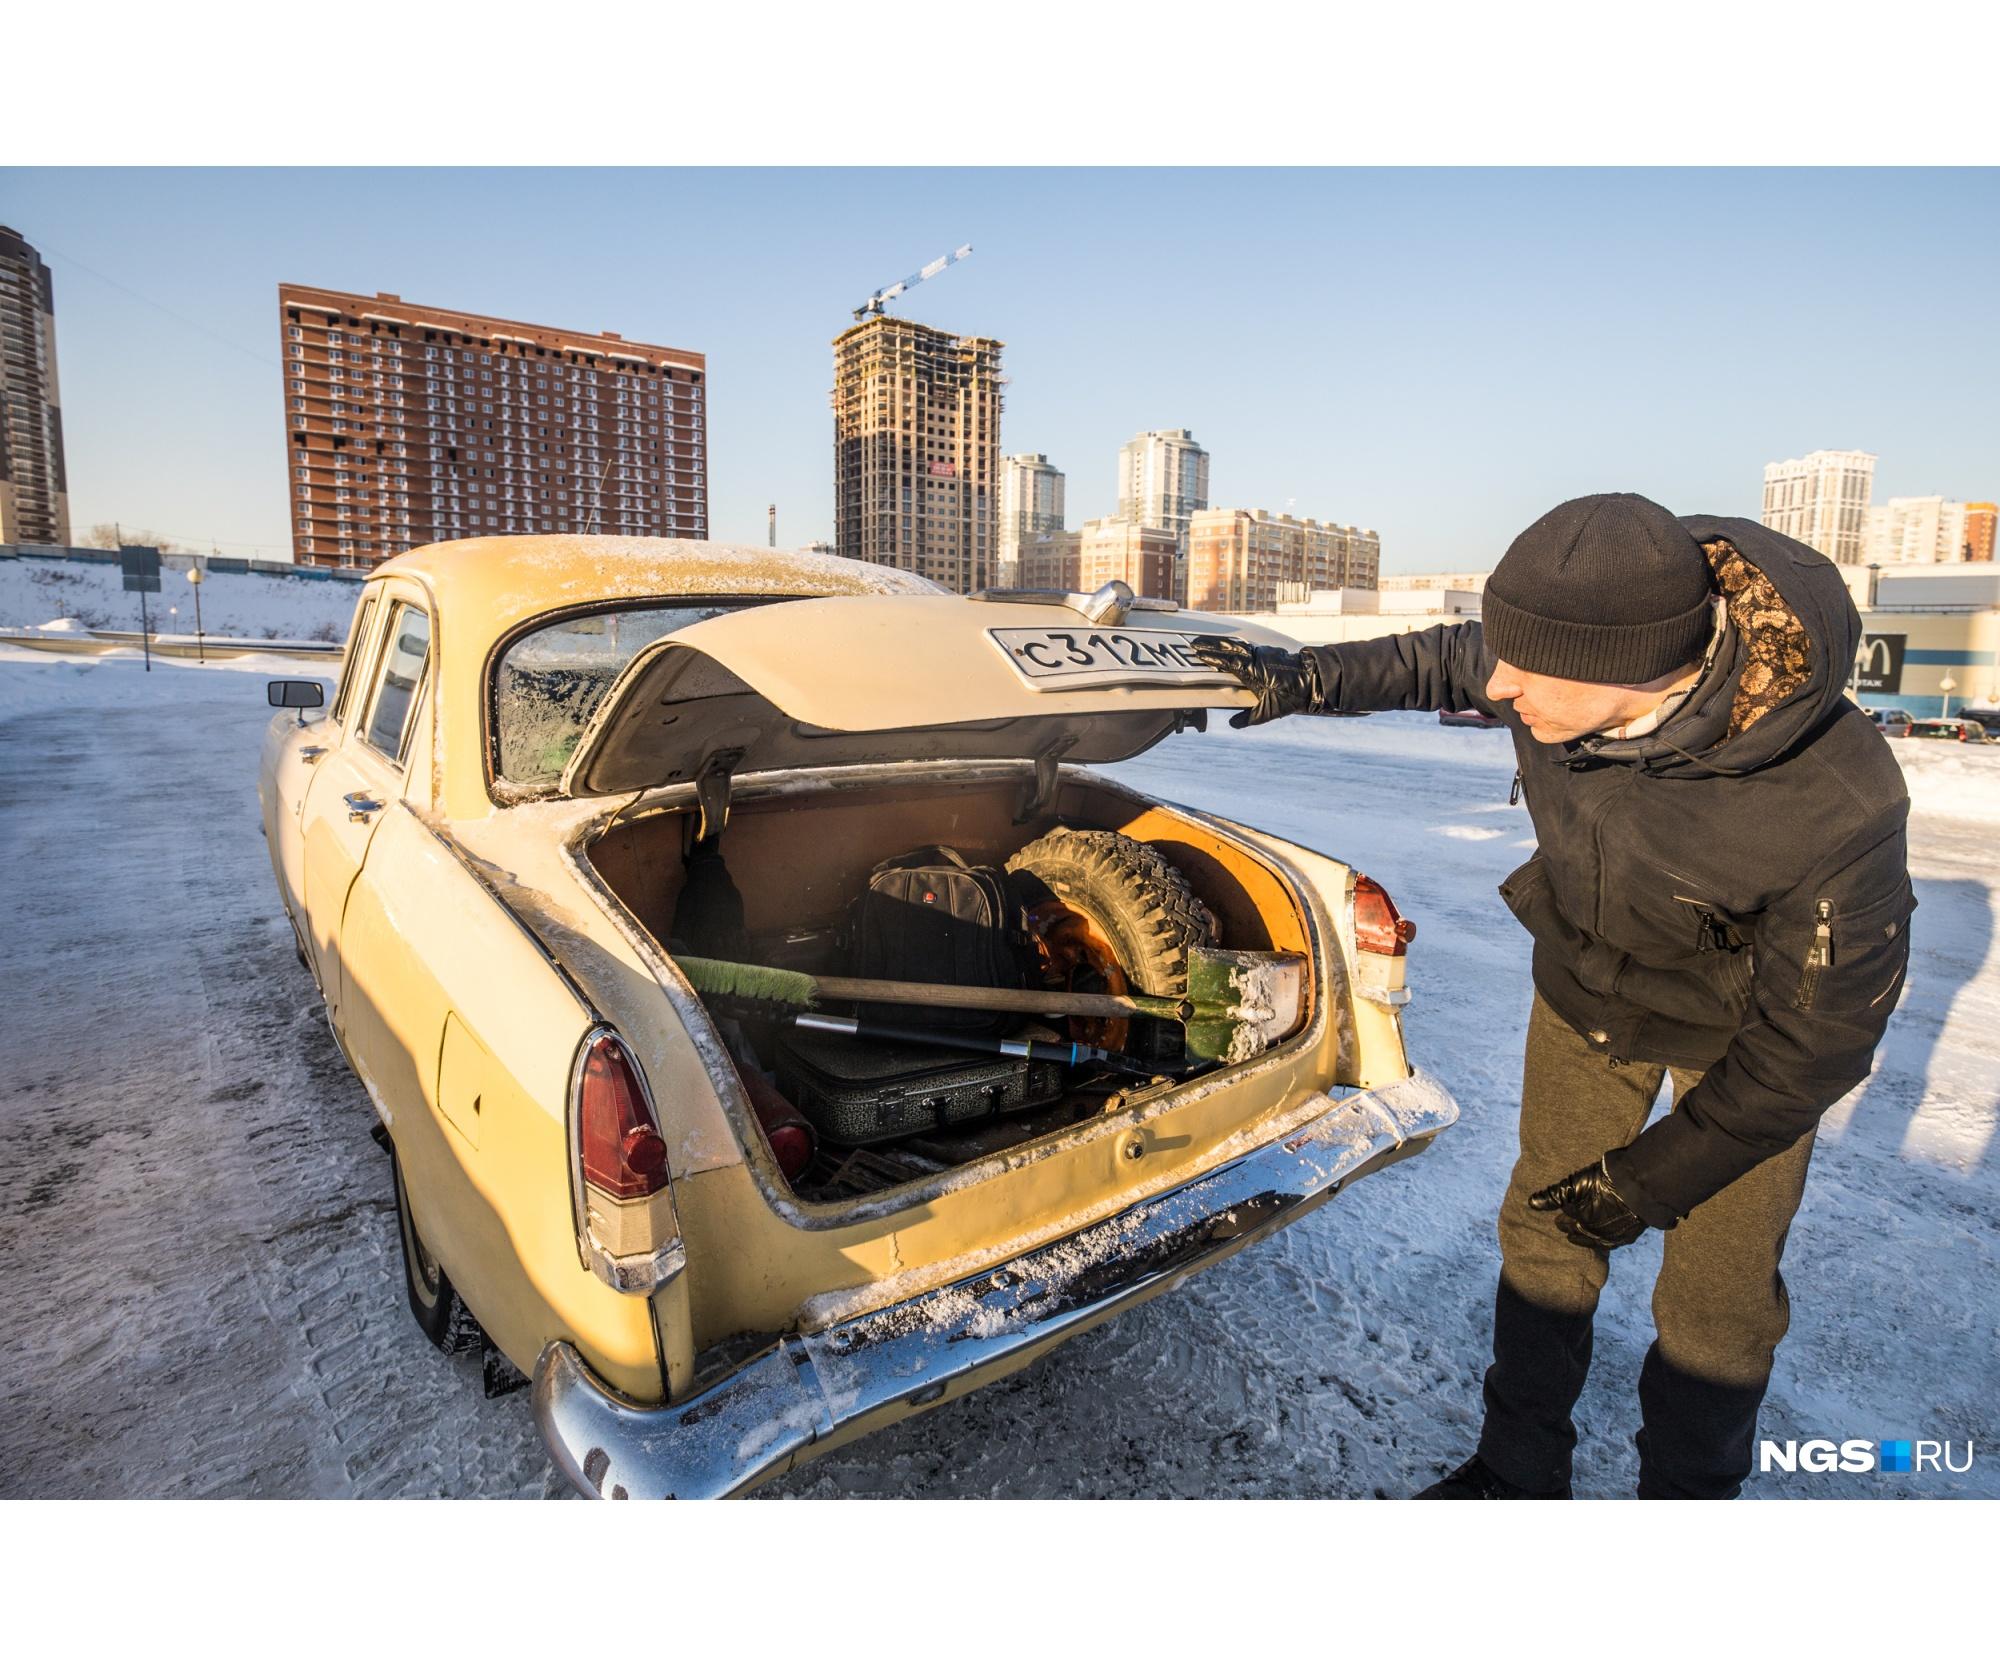 В багажнике лопата, запаска, набор инструментов